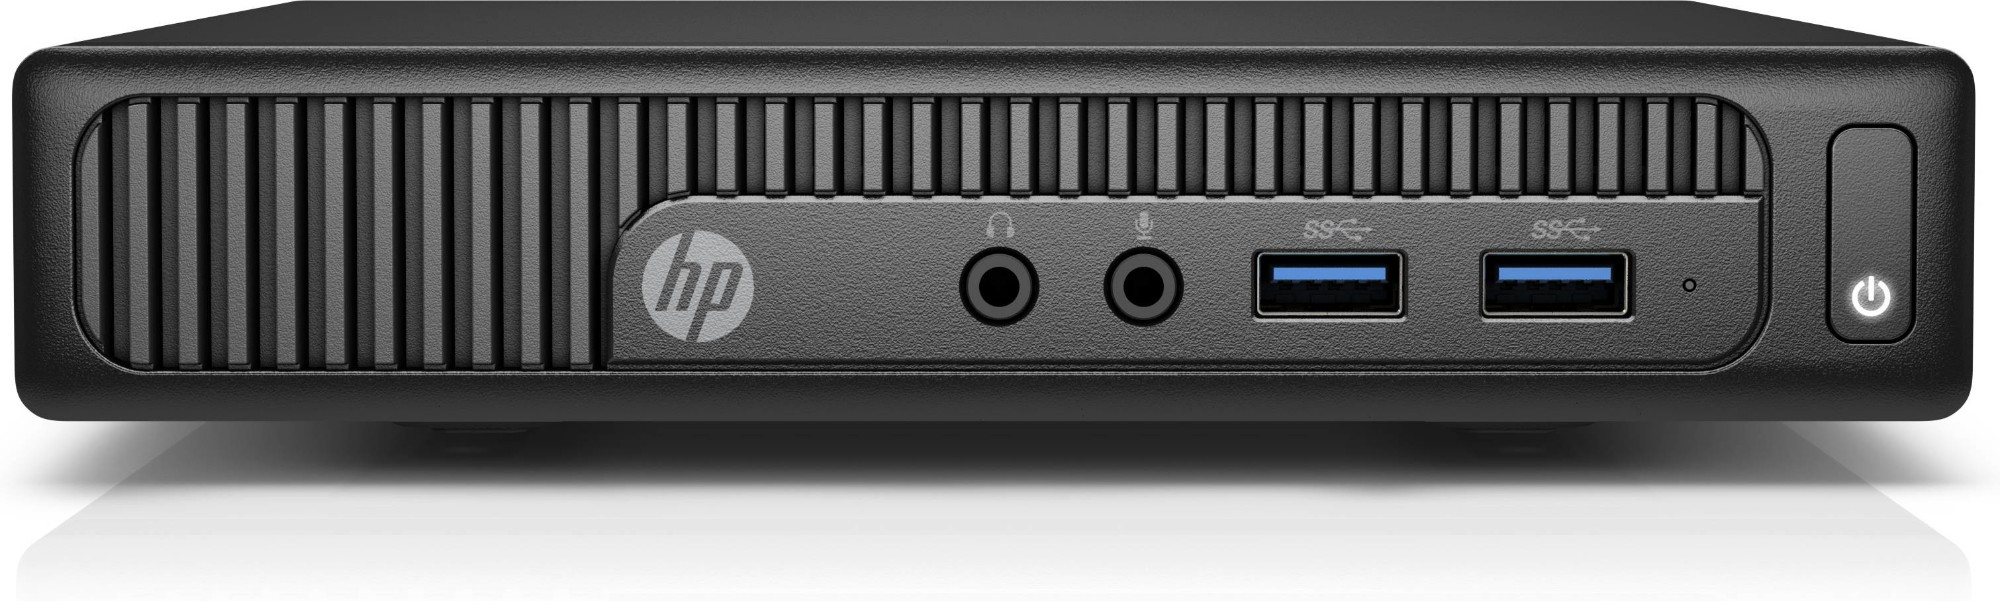 HP 260 G2 Desktop Mini PC (ENERGY STAR)